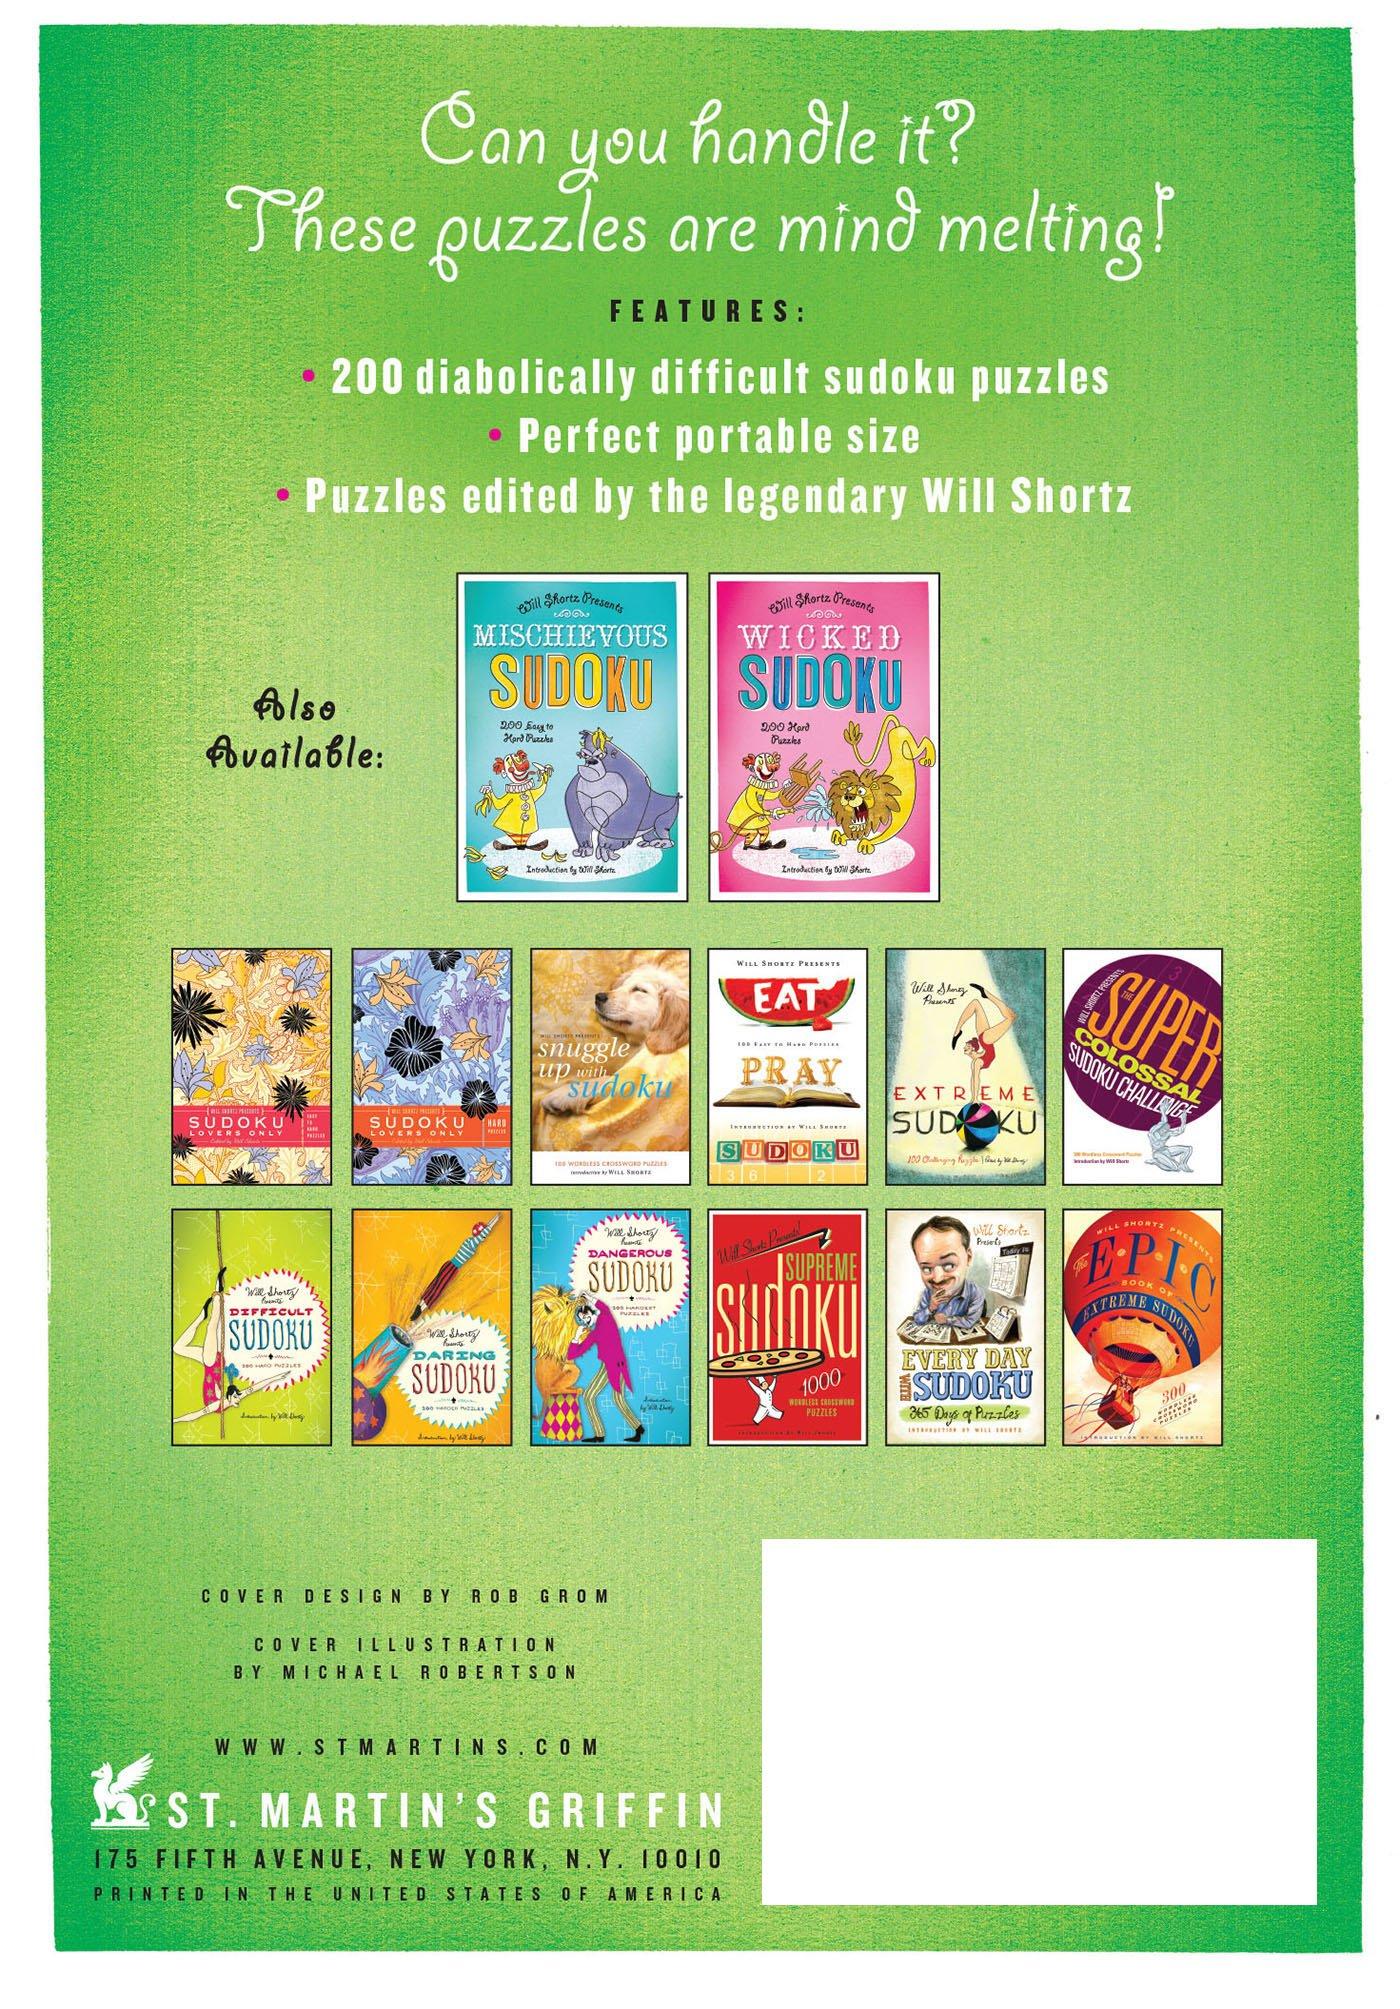 Will Shortz Presents Devious Sudoku: 200 Very Hard Puzzles: Will Shortz:  9781250003980: Amazon.com: Books